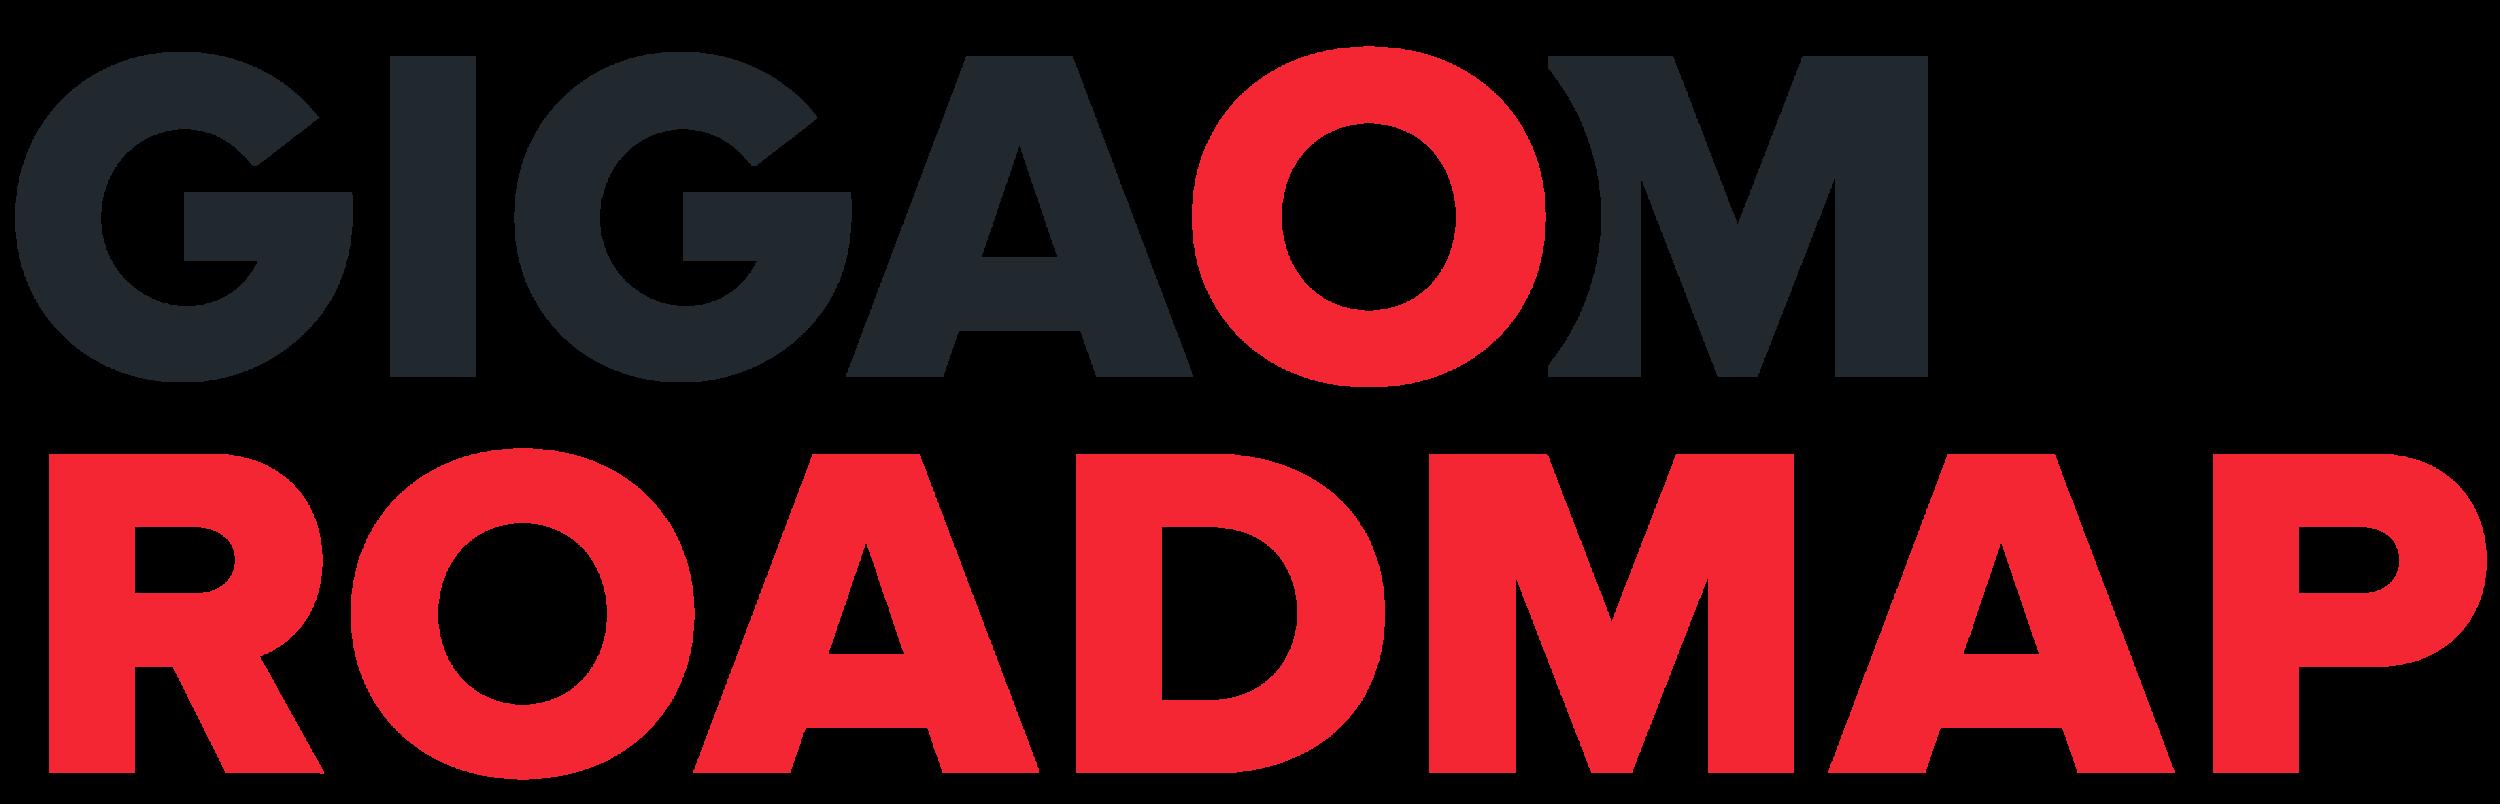 gigaom_roadmap_media.png